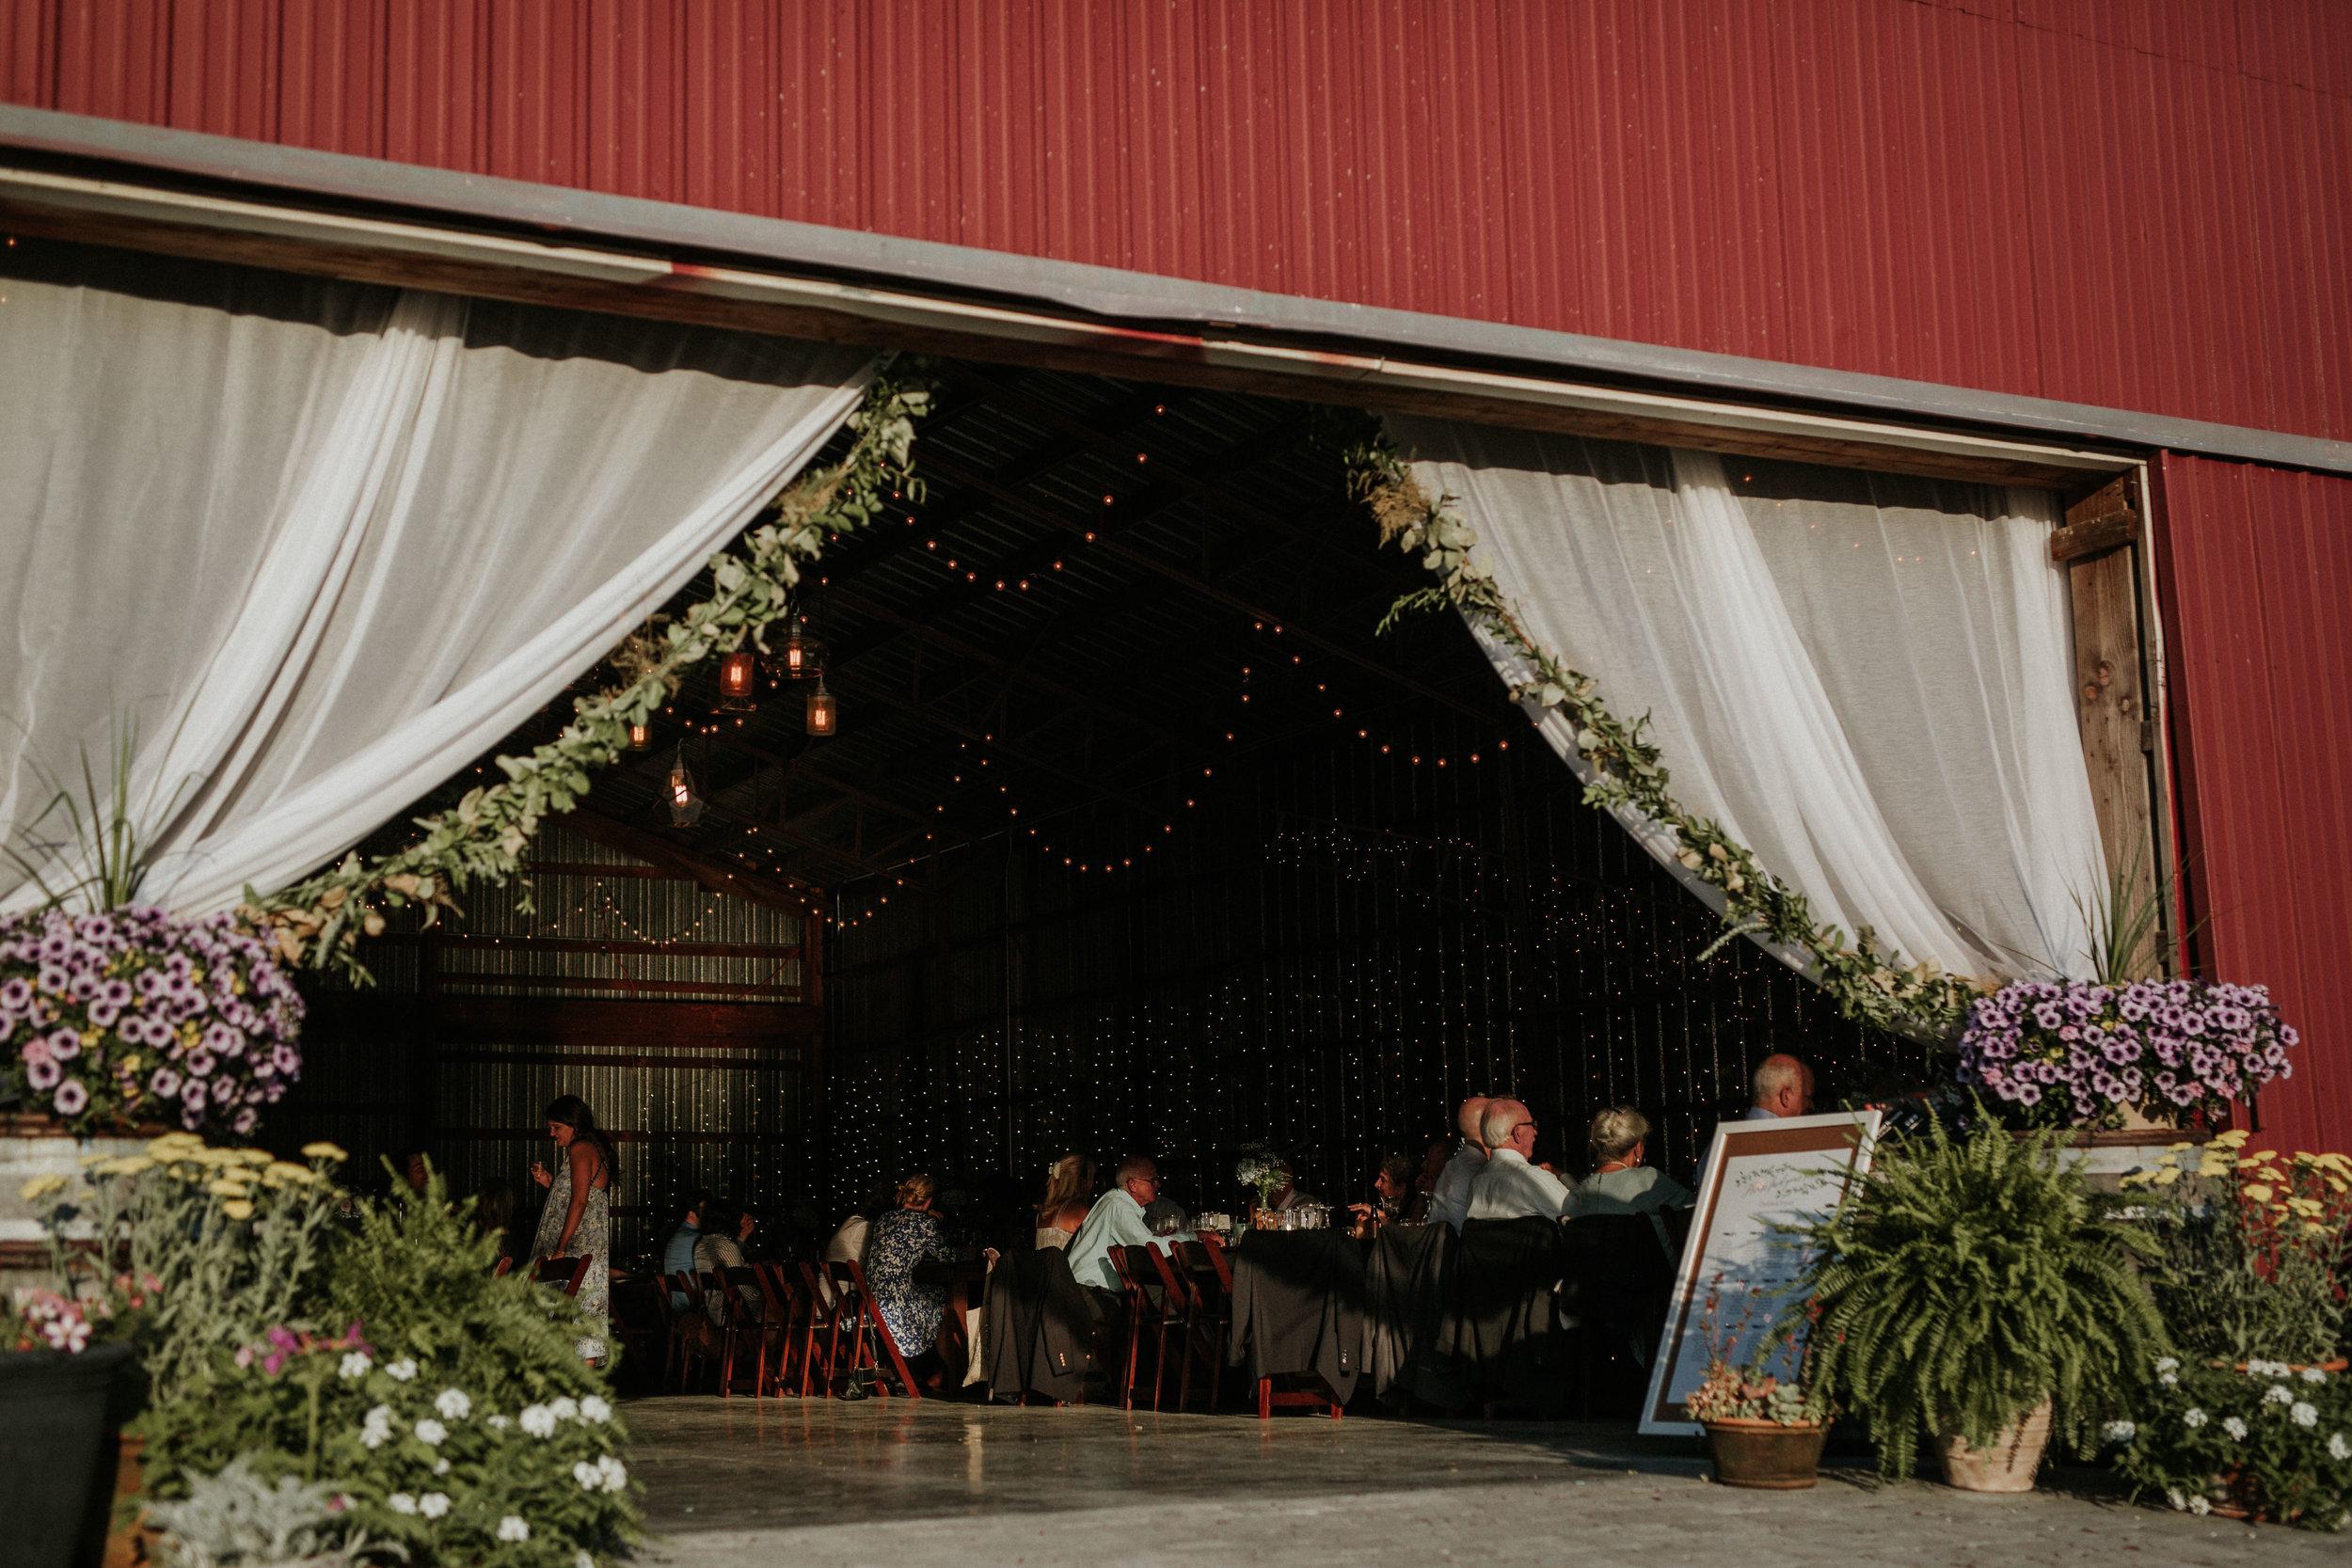 nostrano_vineyards_wedding_0075.JPG